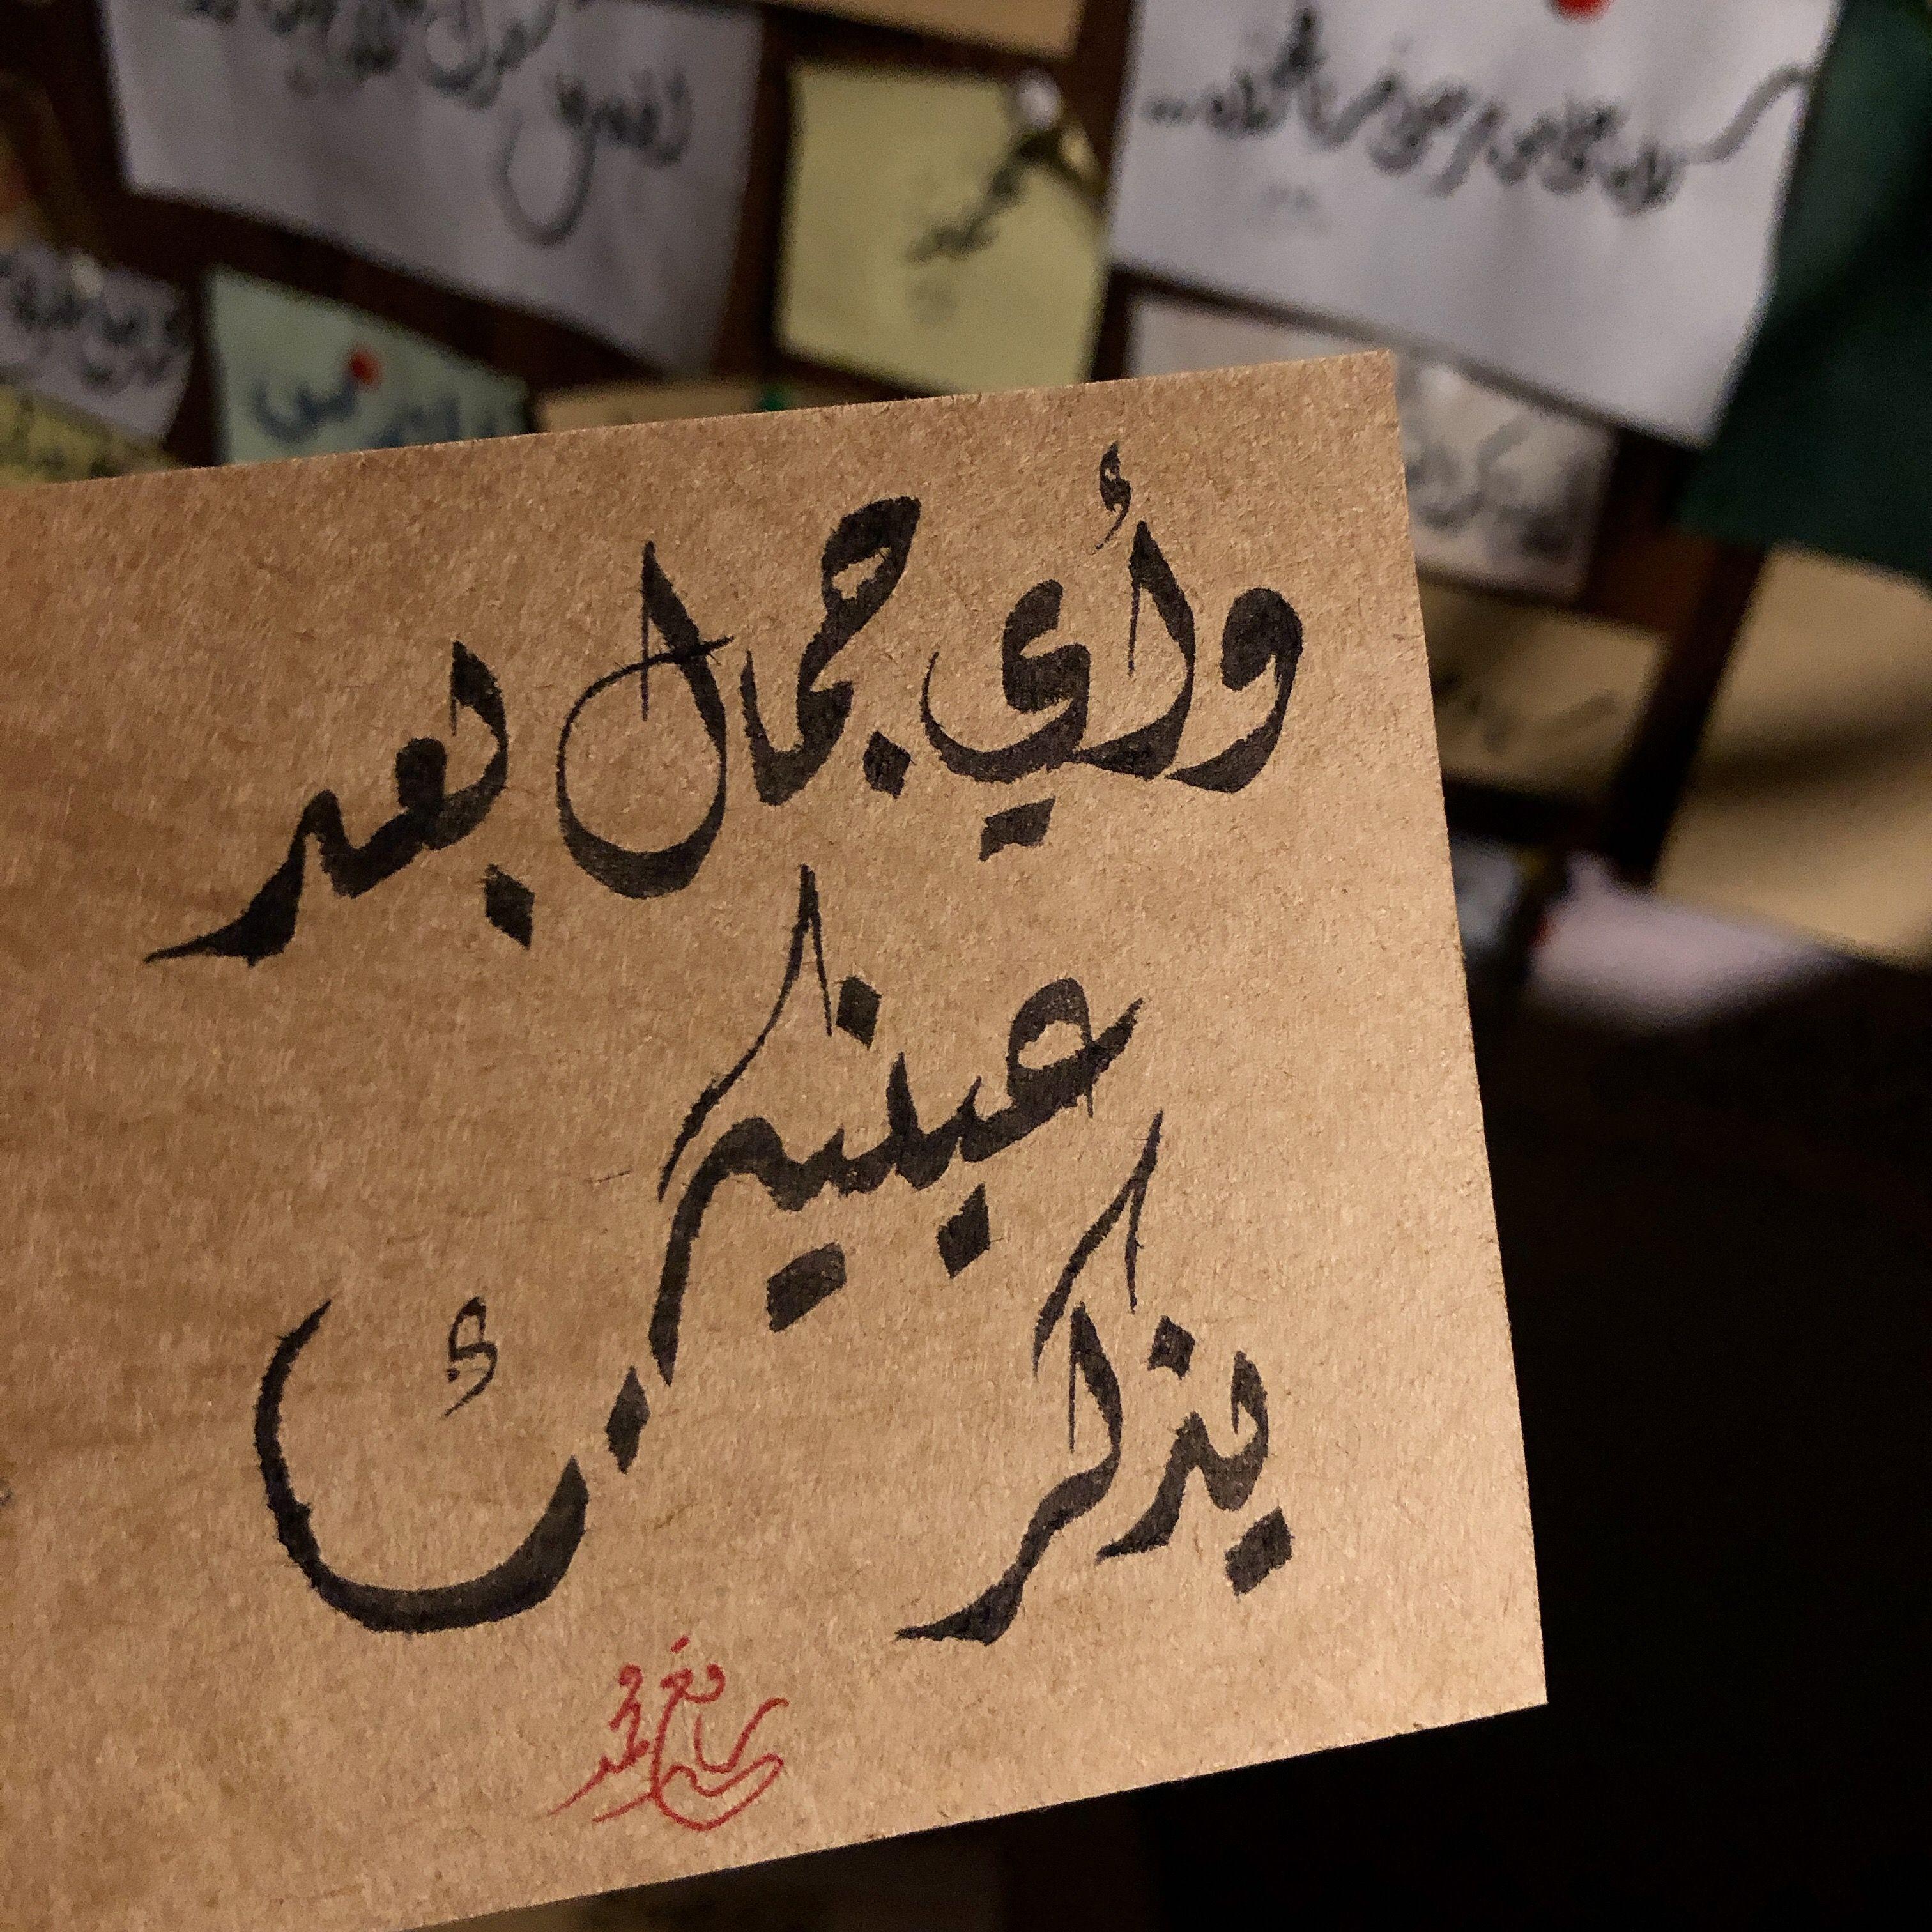 خط خط عربي Homedecor Arabic Tattoo Quotes Calligraphy Art Quotes Quotes For Book Lovers